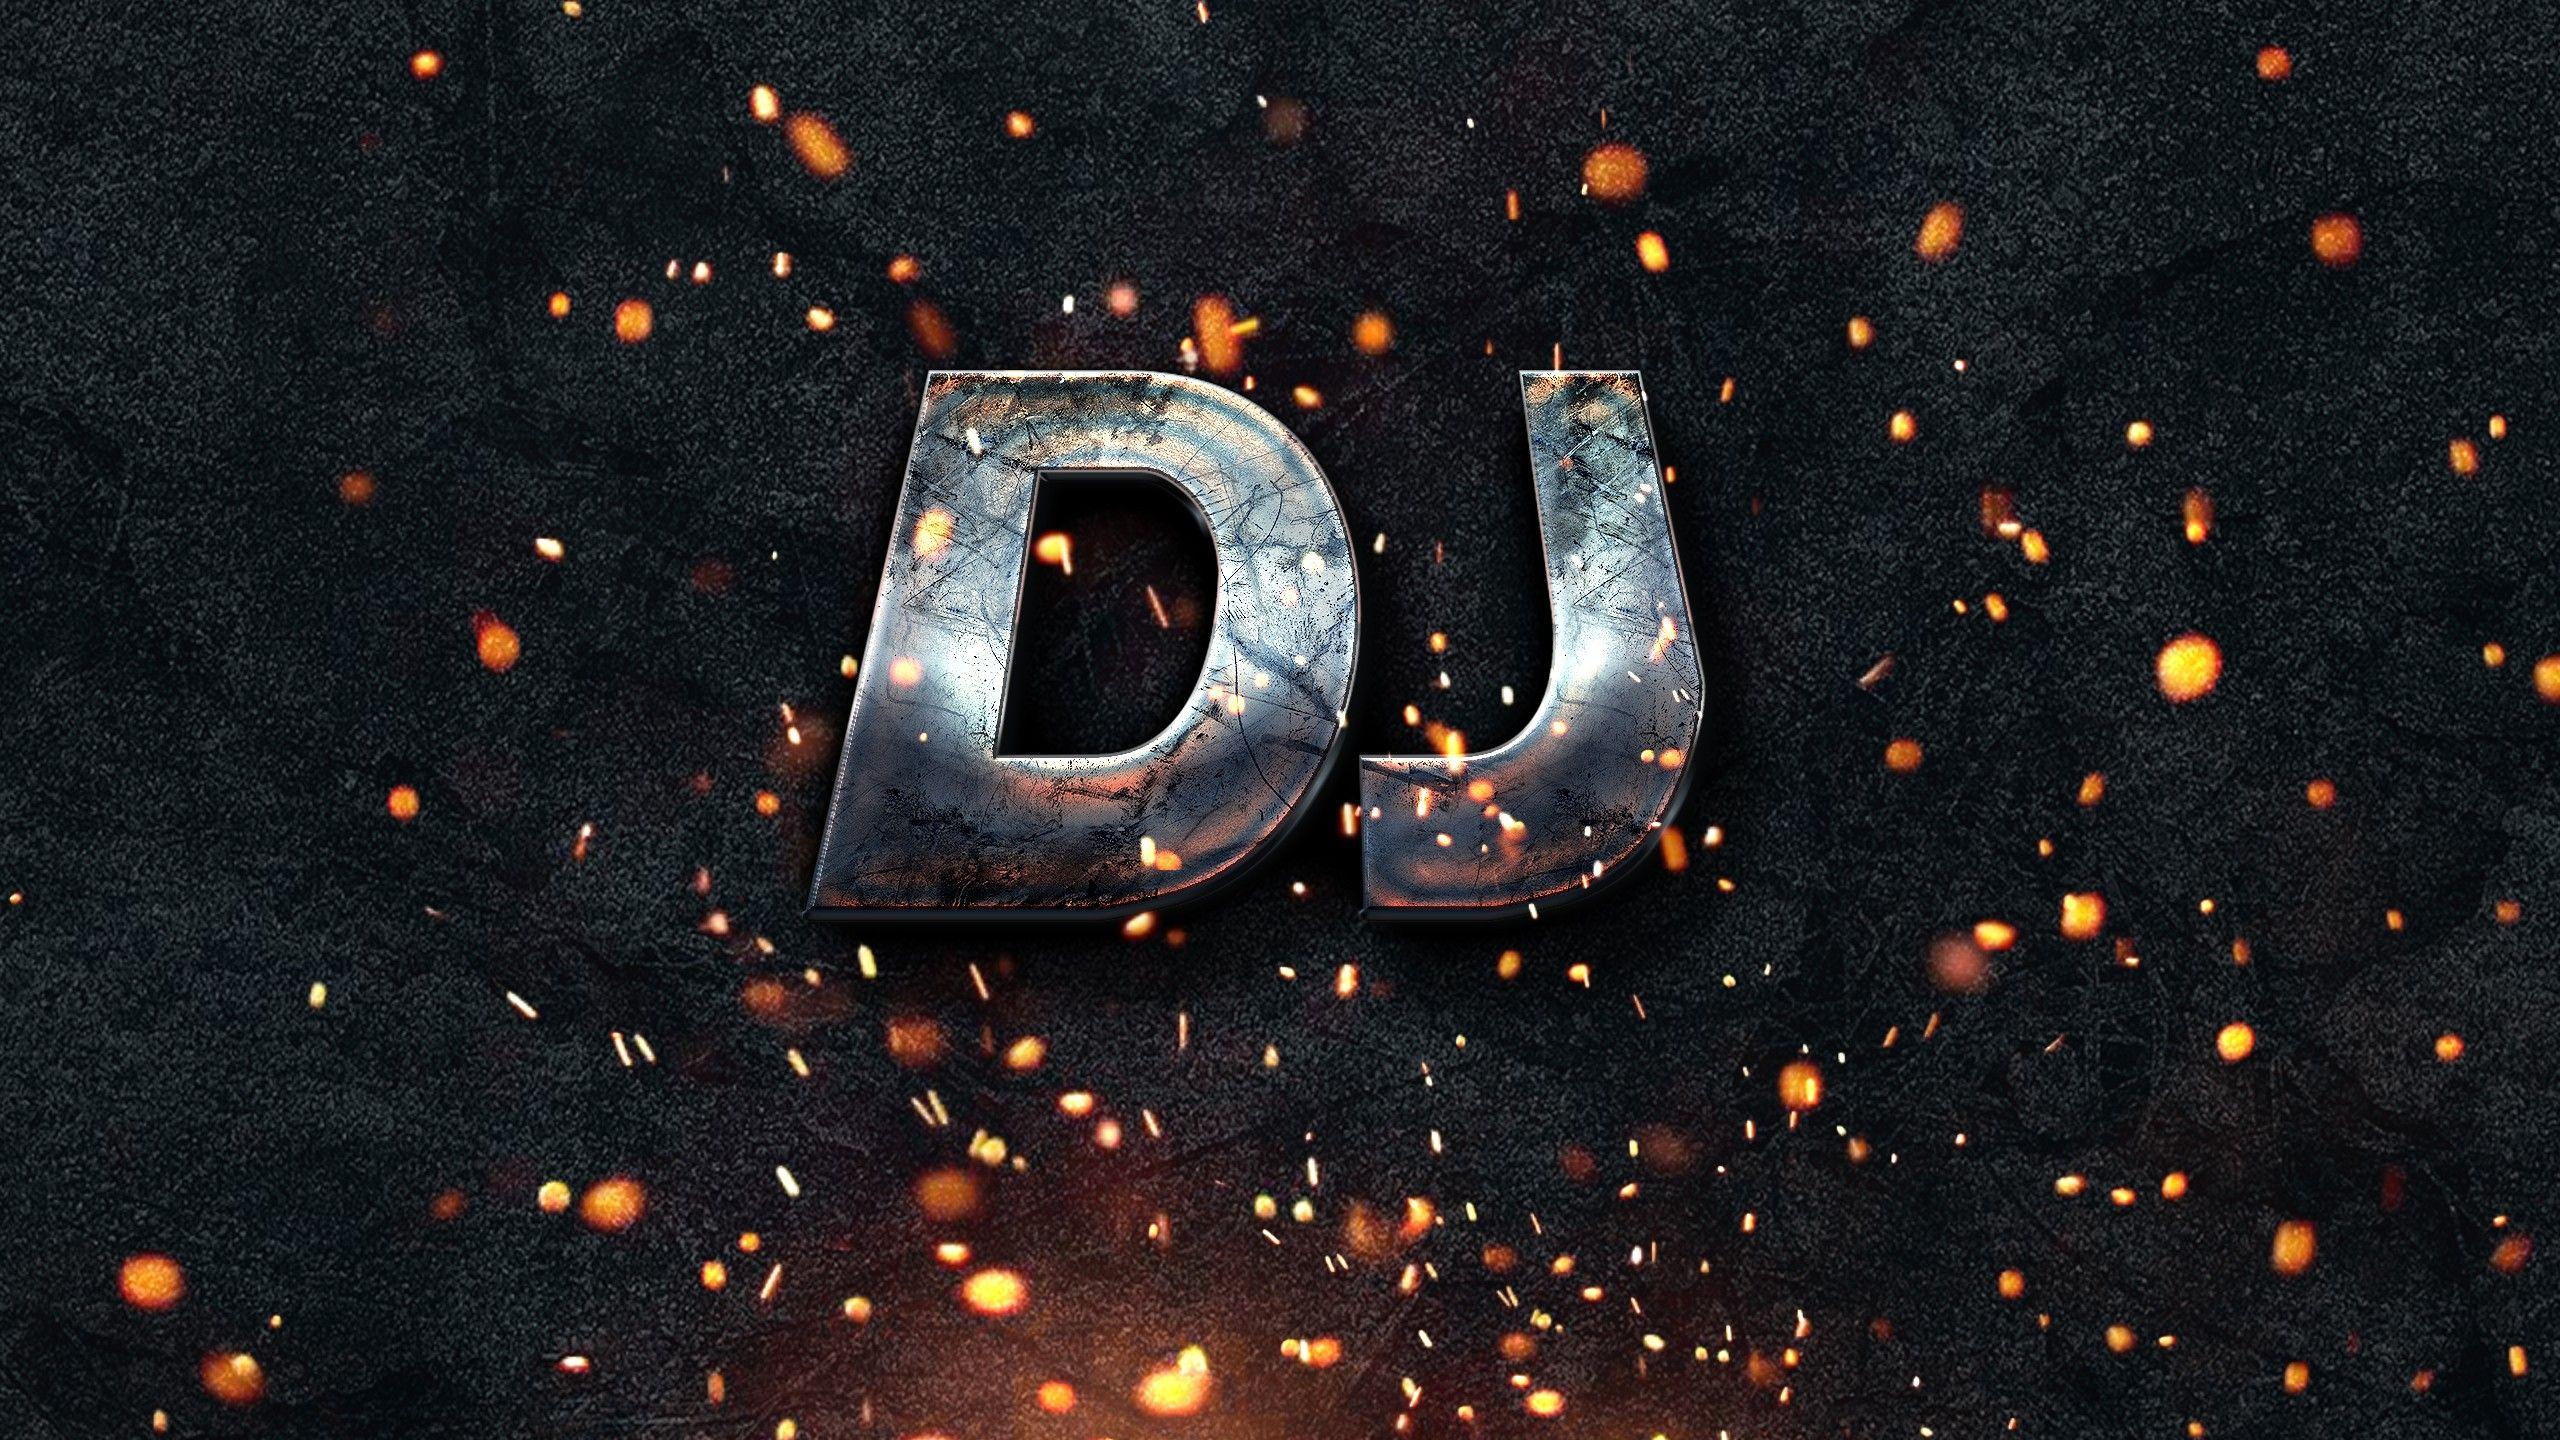 Armenian Dj For Private Events Dj Images Dj Equipment Music Wallpaper